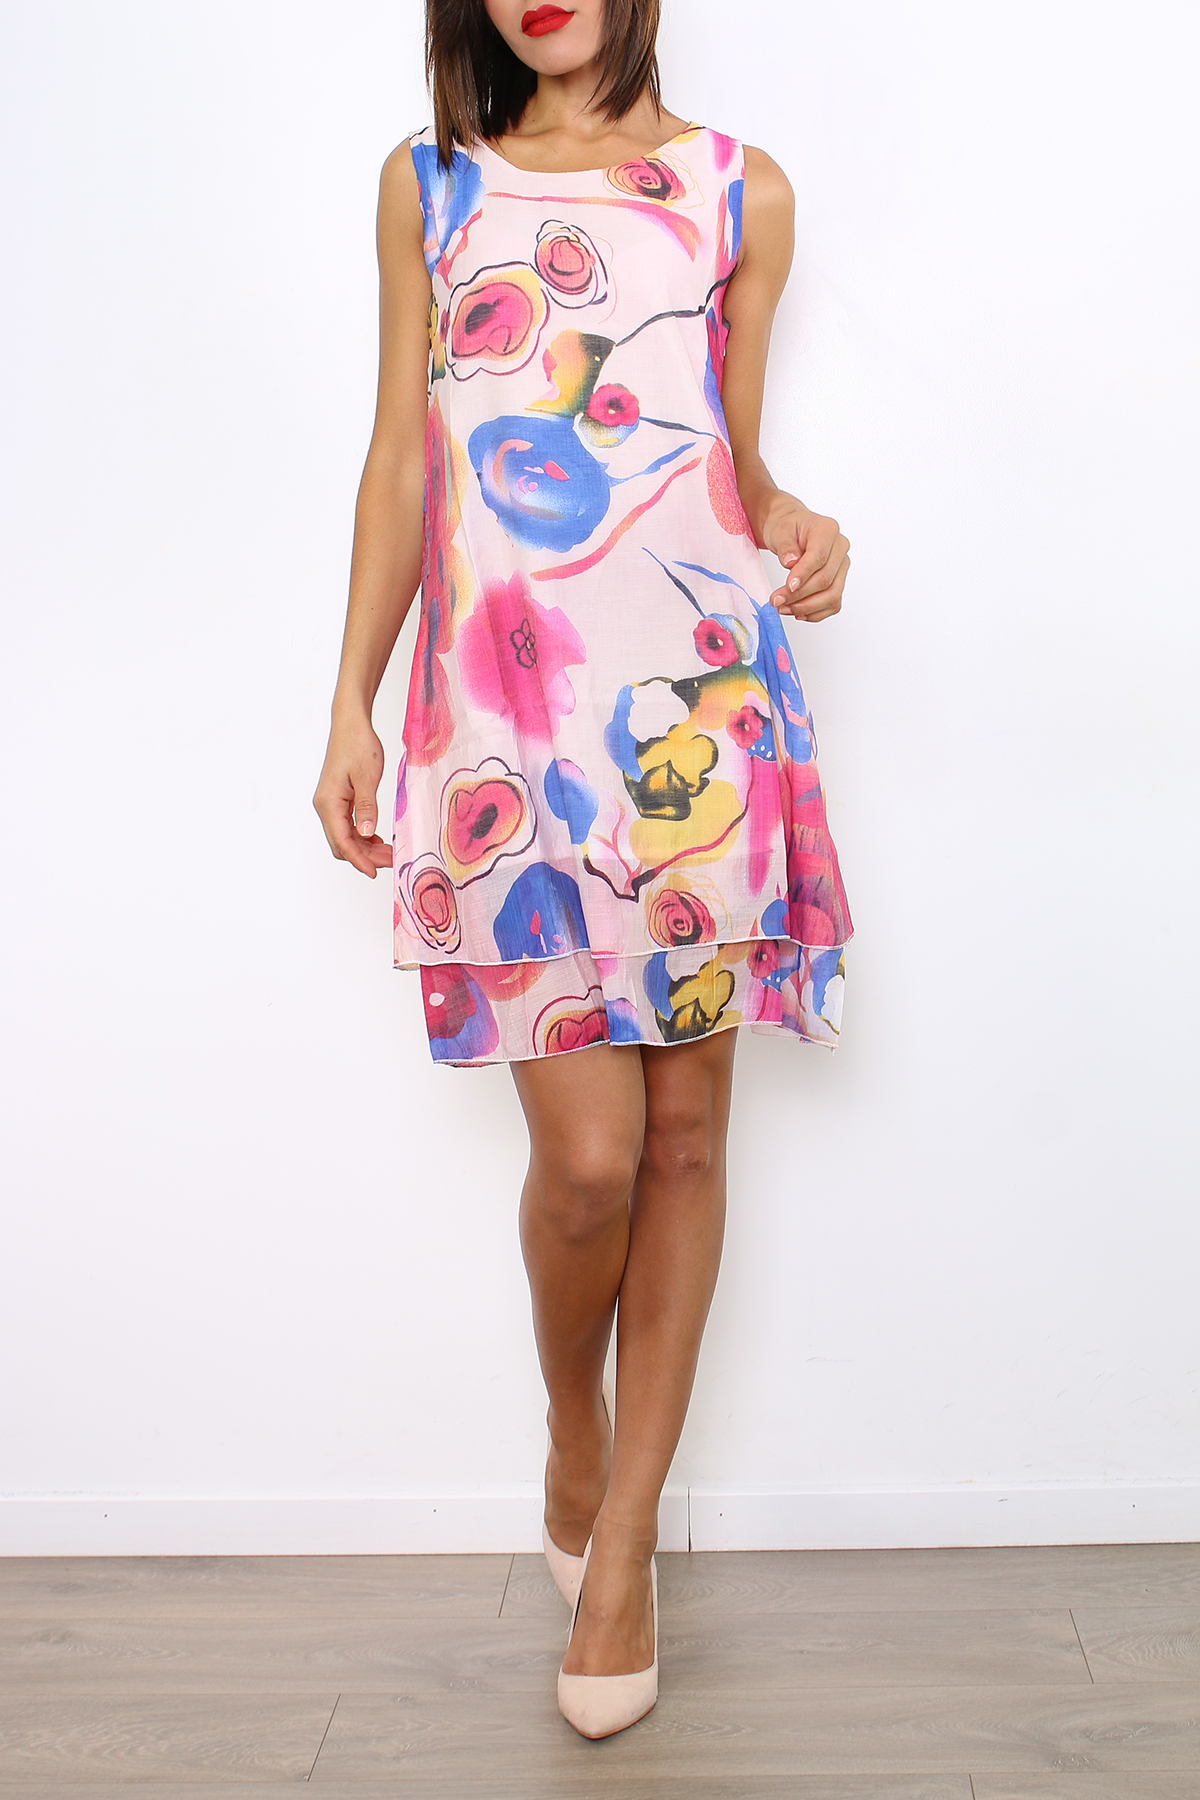 Robes longues Femme 2651-BLEU For Her Paris (SHINIE)